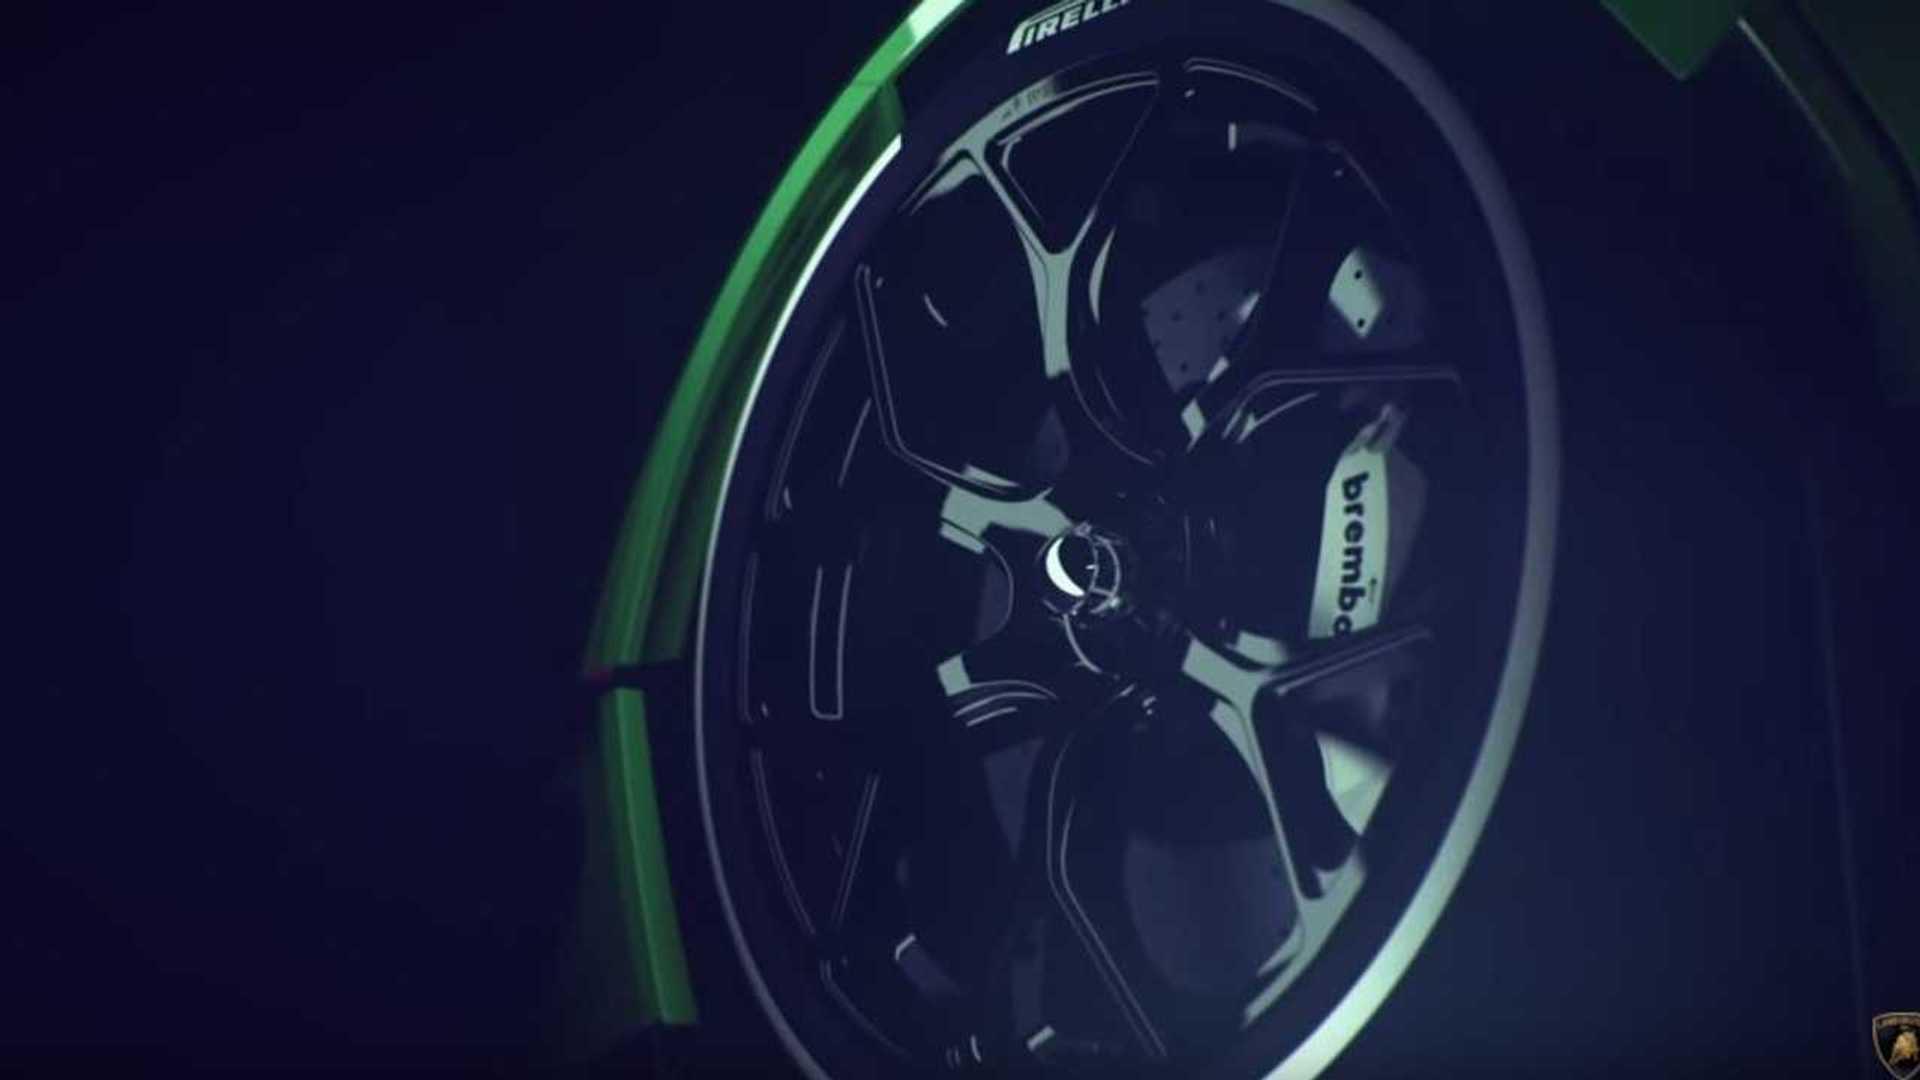 Lamborghini Teases Track-Only V12 Hypercar With 830 Horsepower